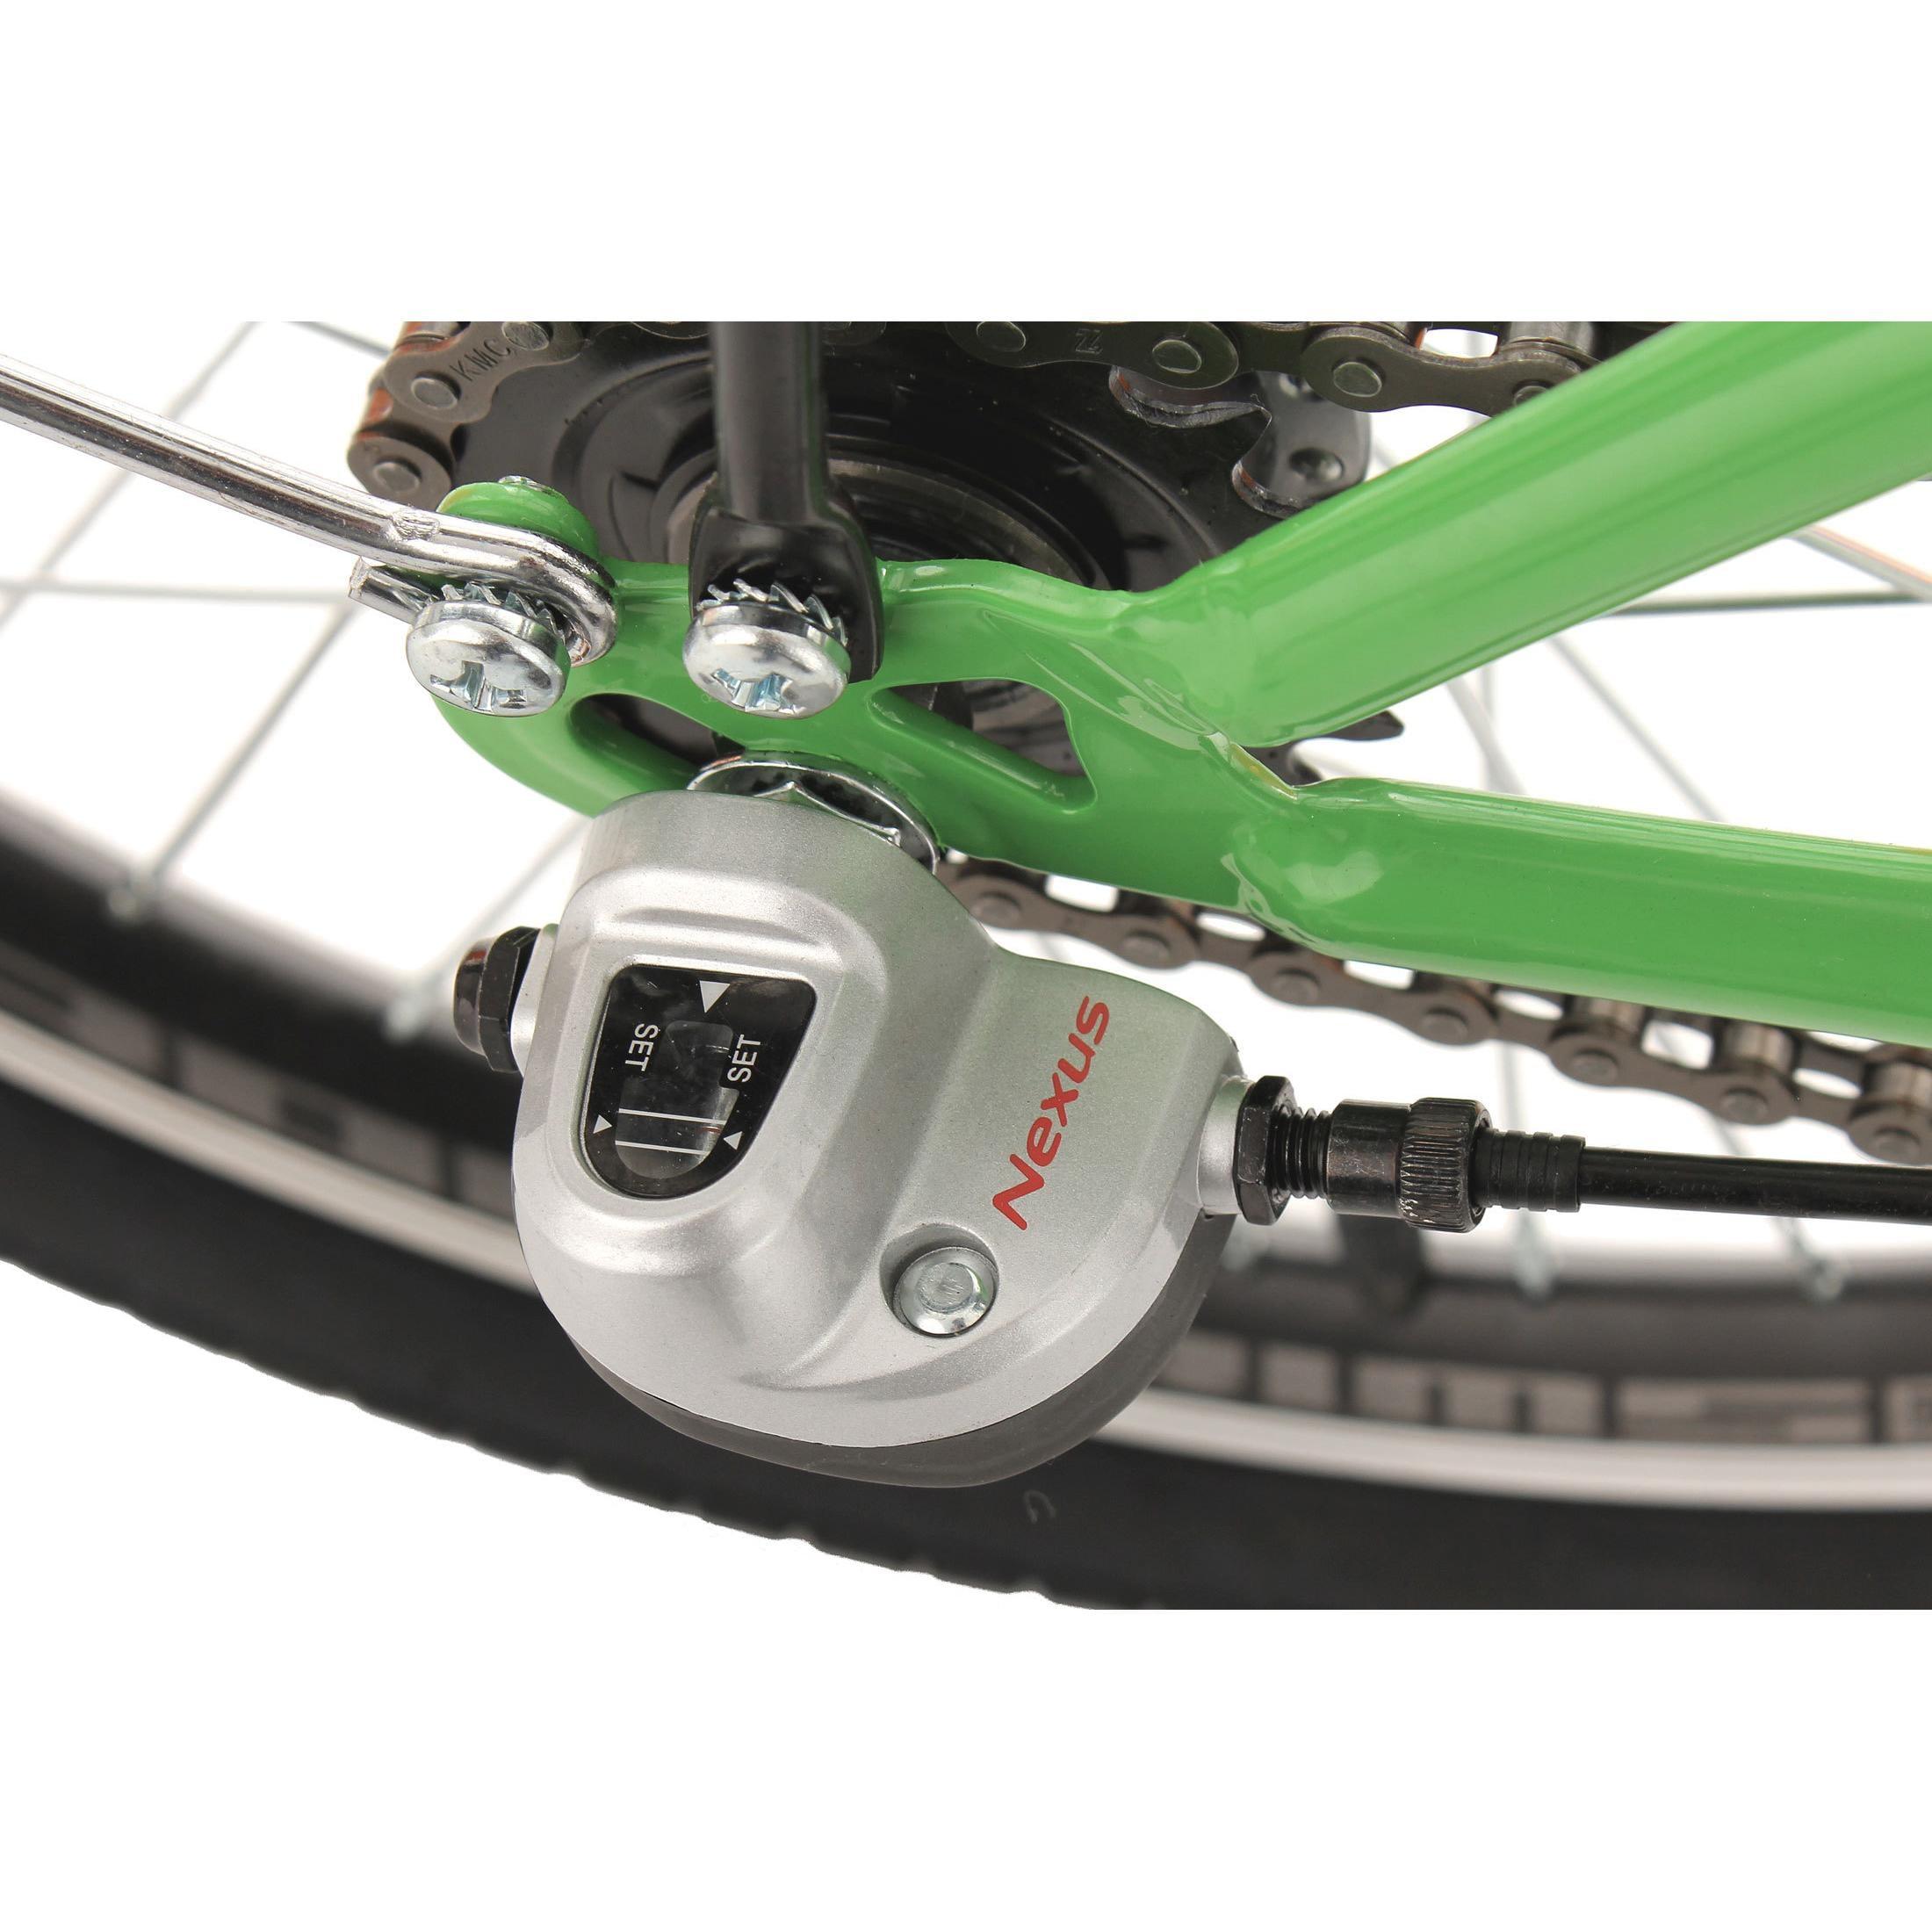 KS Cycling Faltrad Klapprad FX300 3 Gänge, 20 Zoll